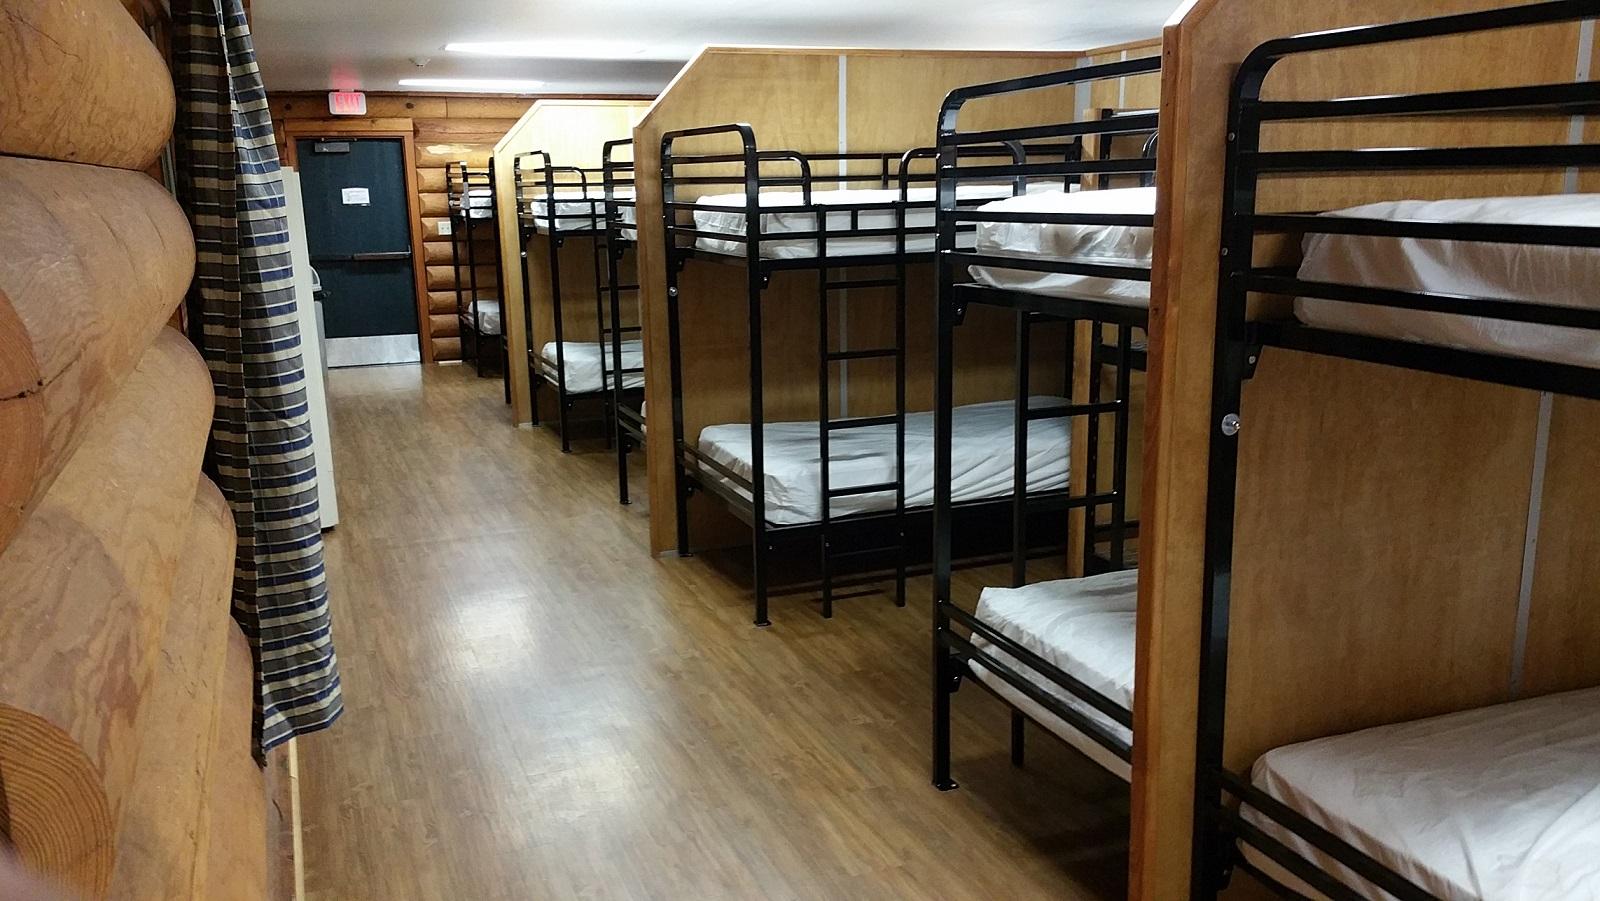 Hostel Bunk Bed Jpg Hostel Management